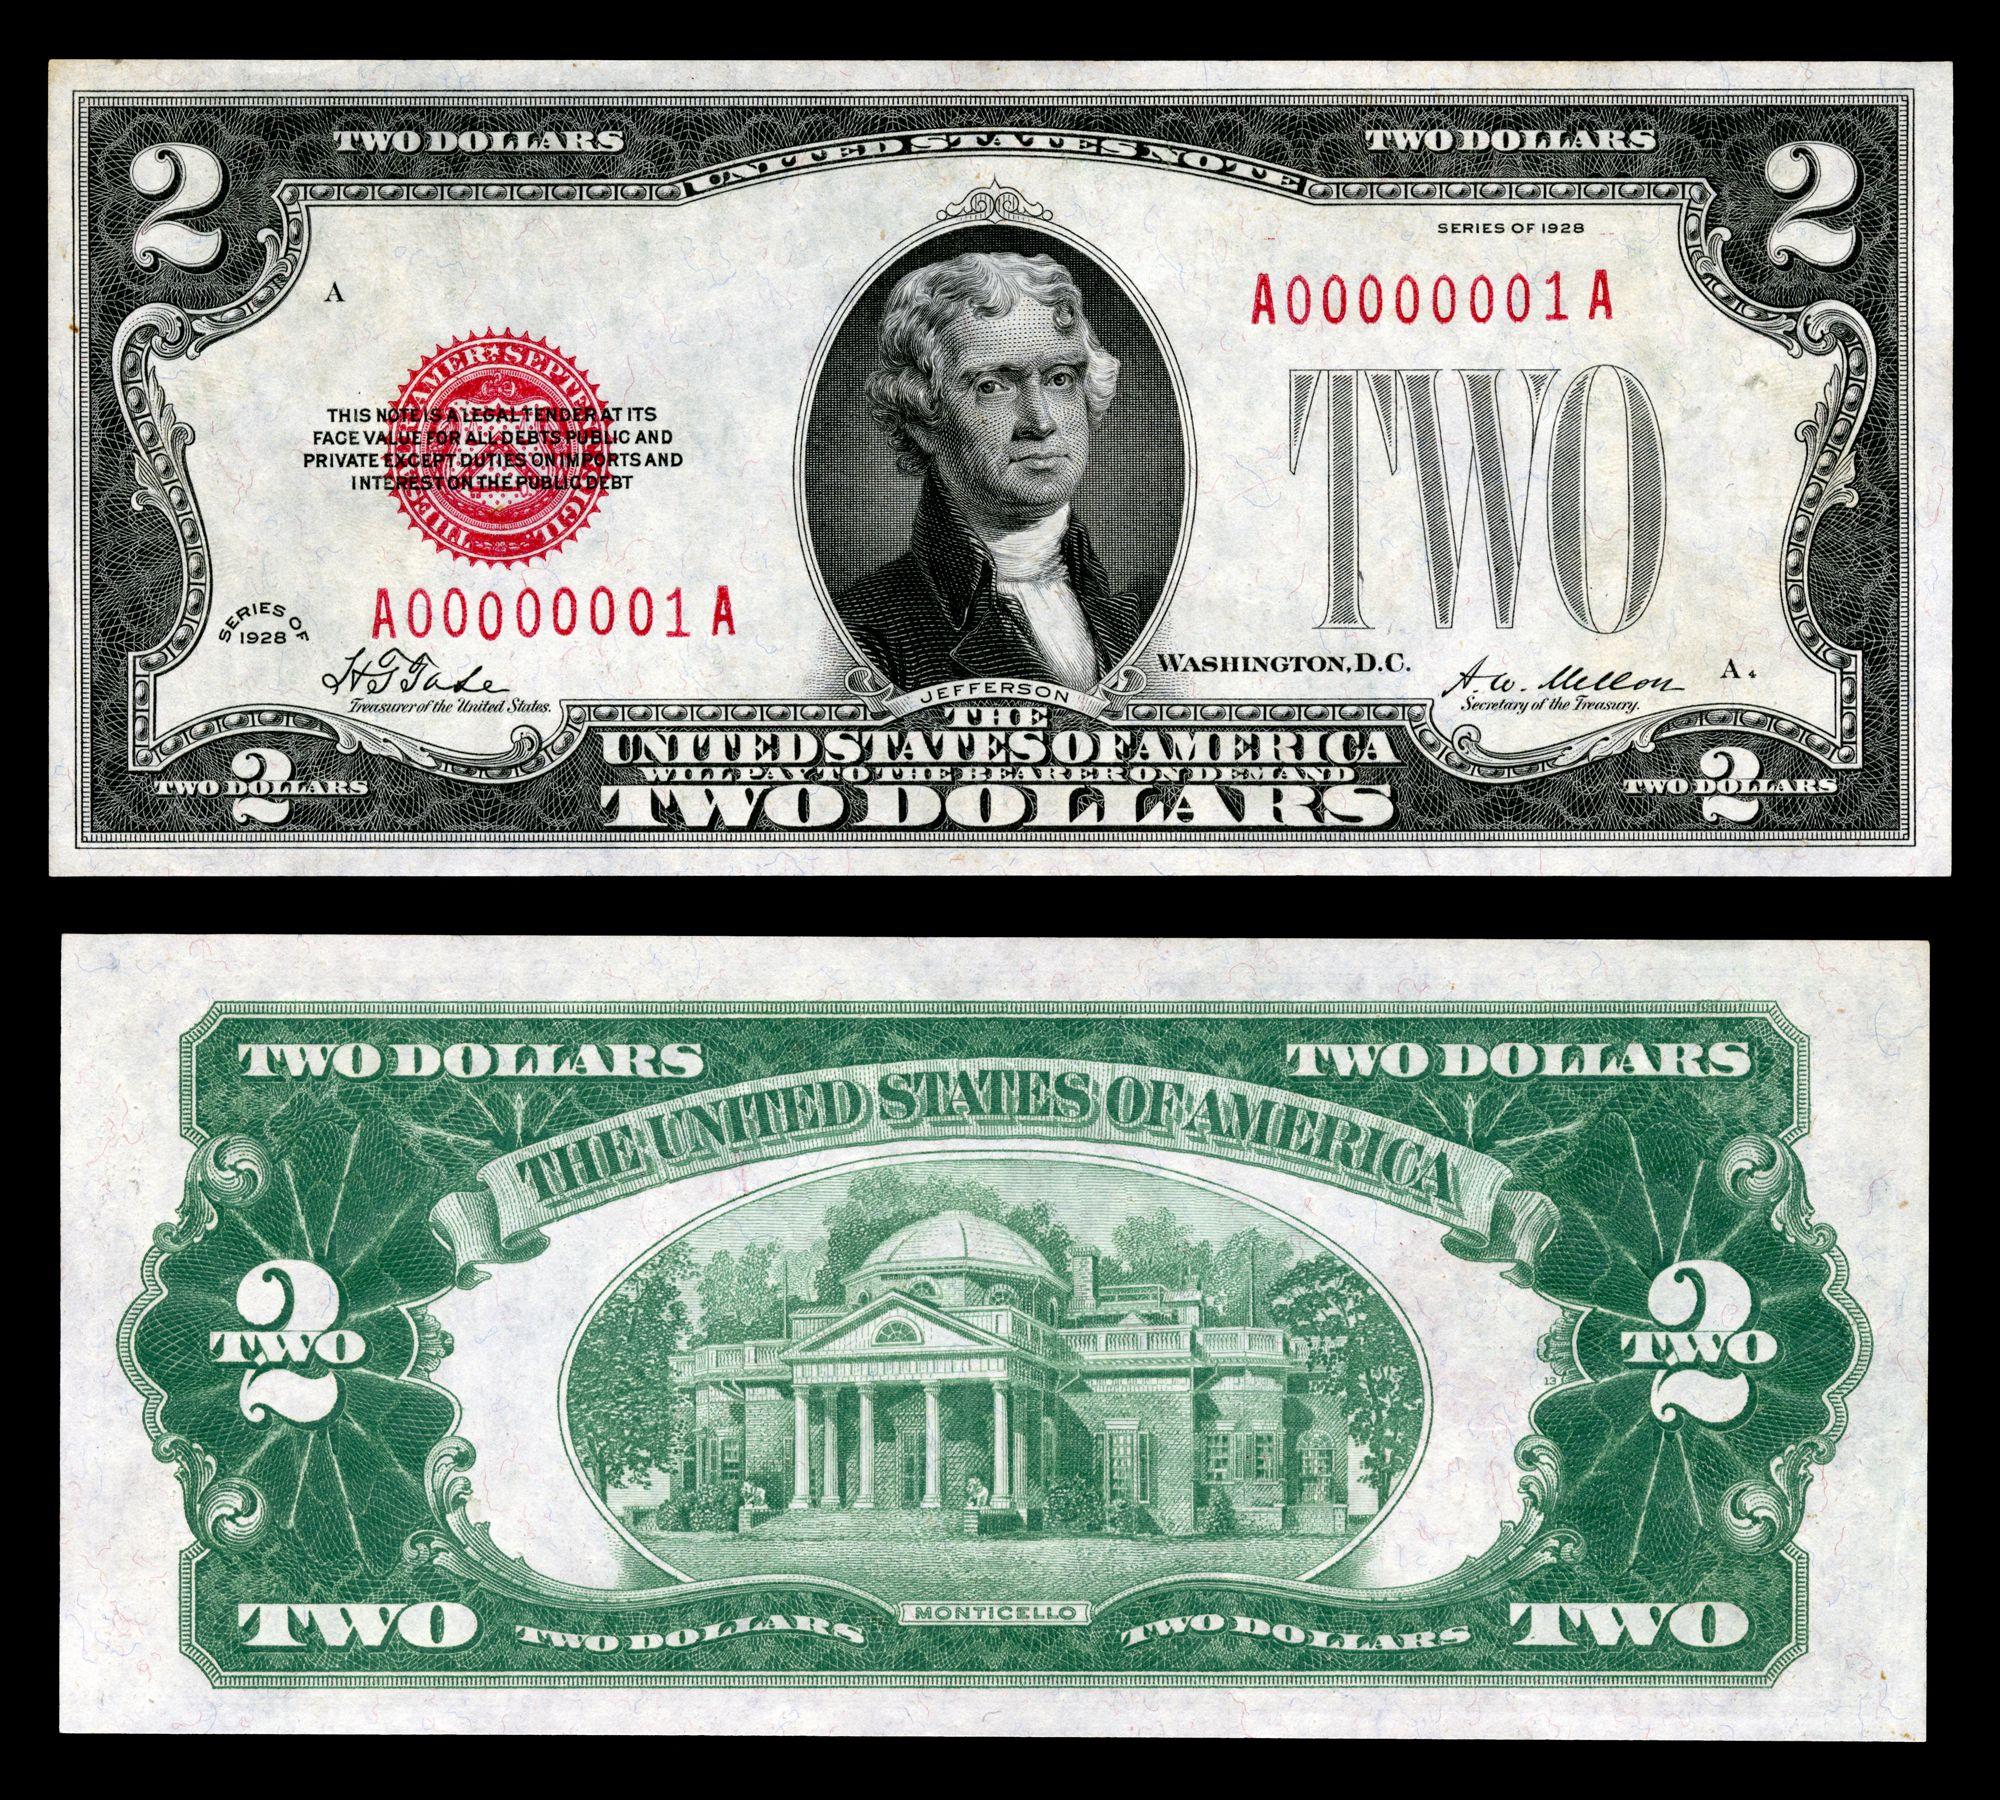 1929 2 Dollar Bill Design Featuring Monticello On Reverse